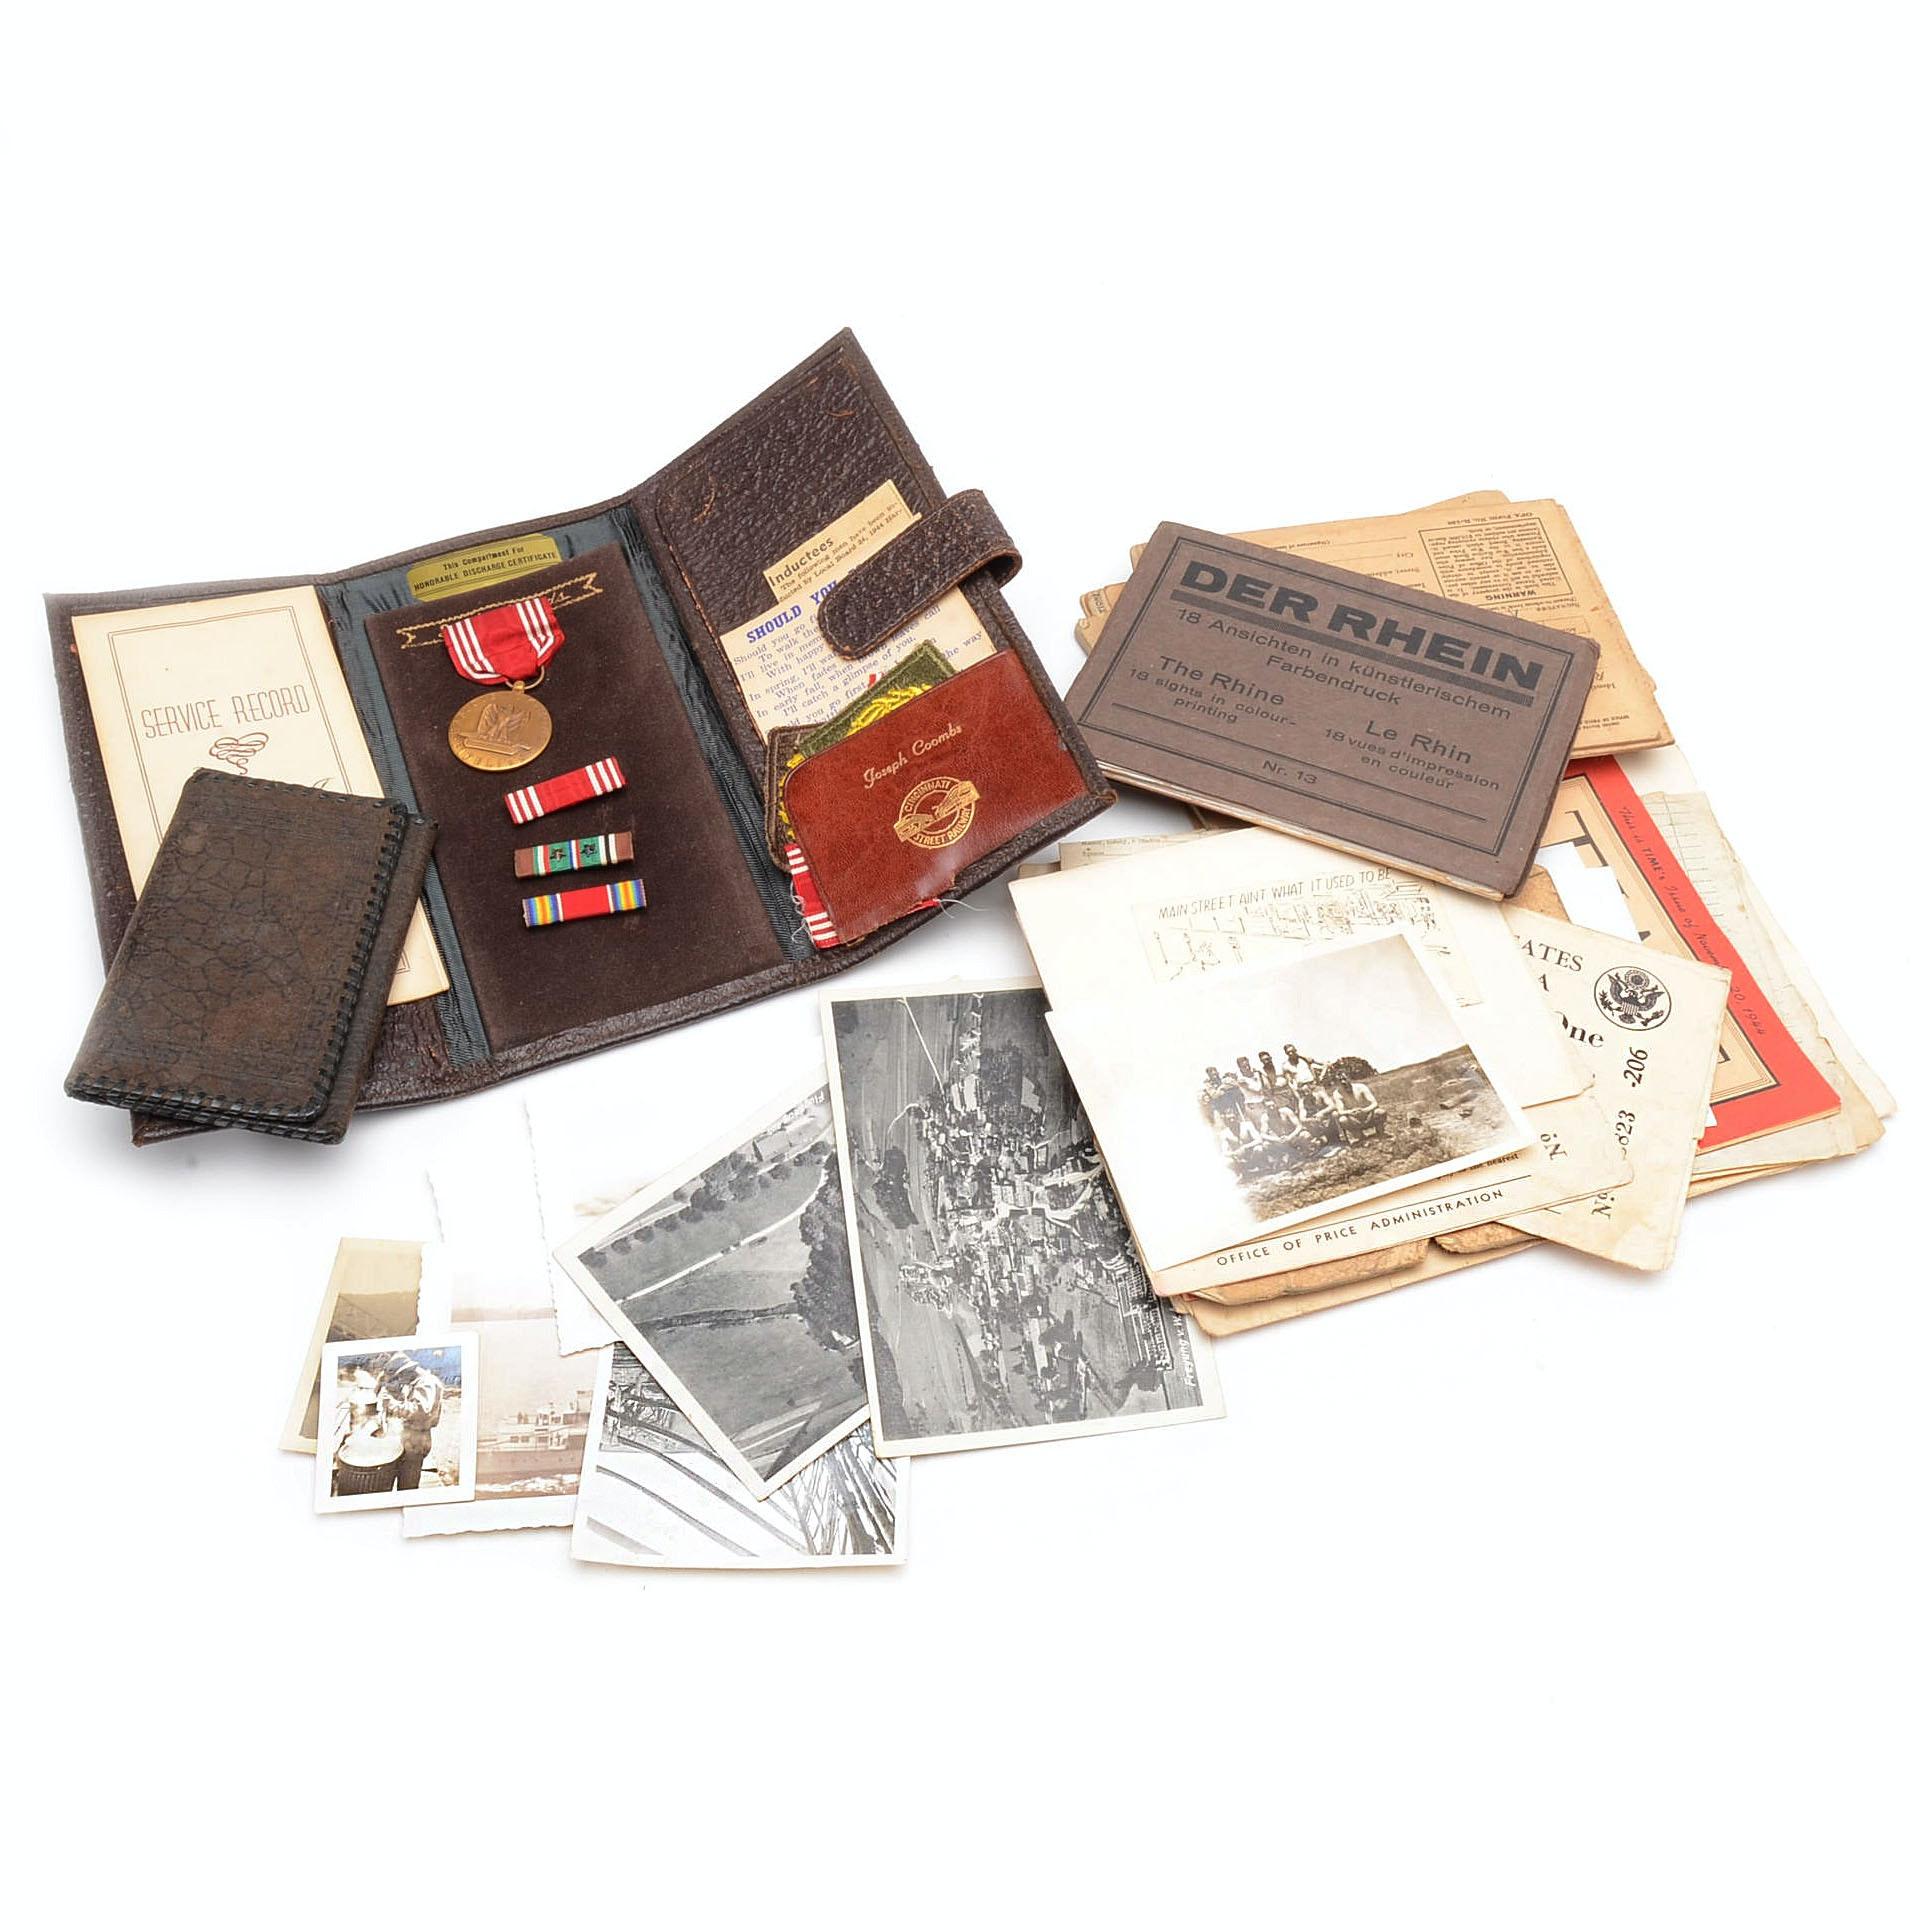 Collection of WWII Ephemera